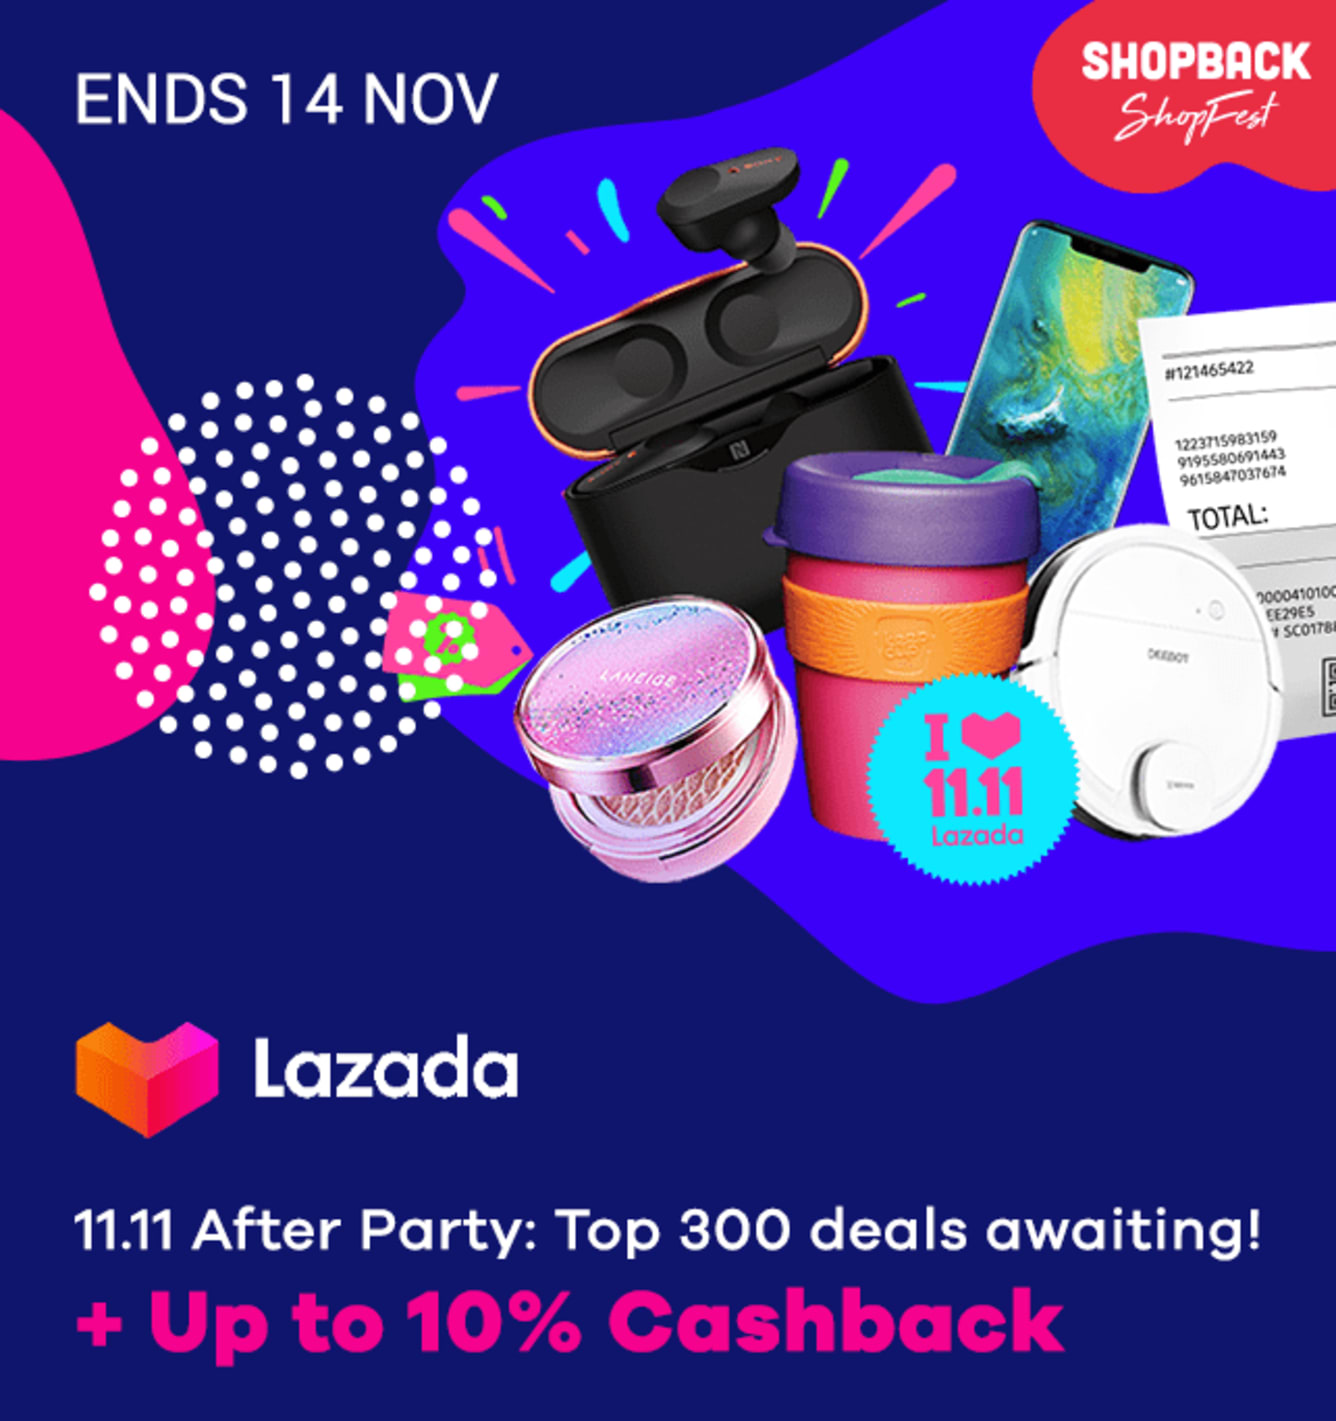 Lazada 11.11 Sale + 10% Cashback